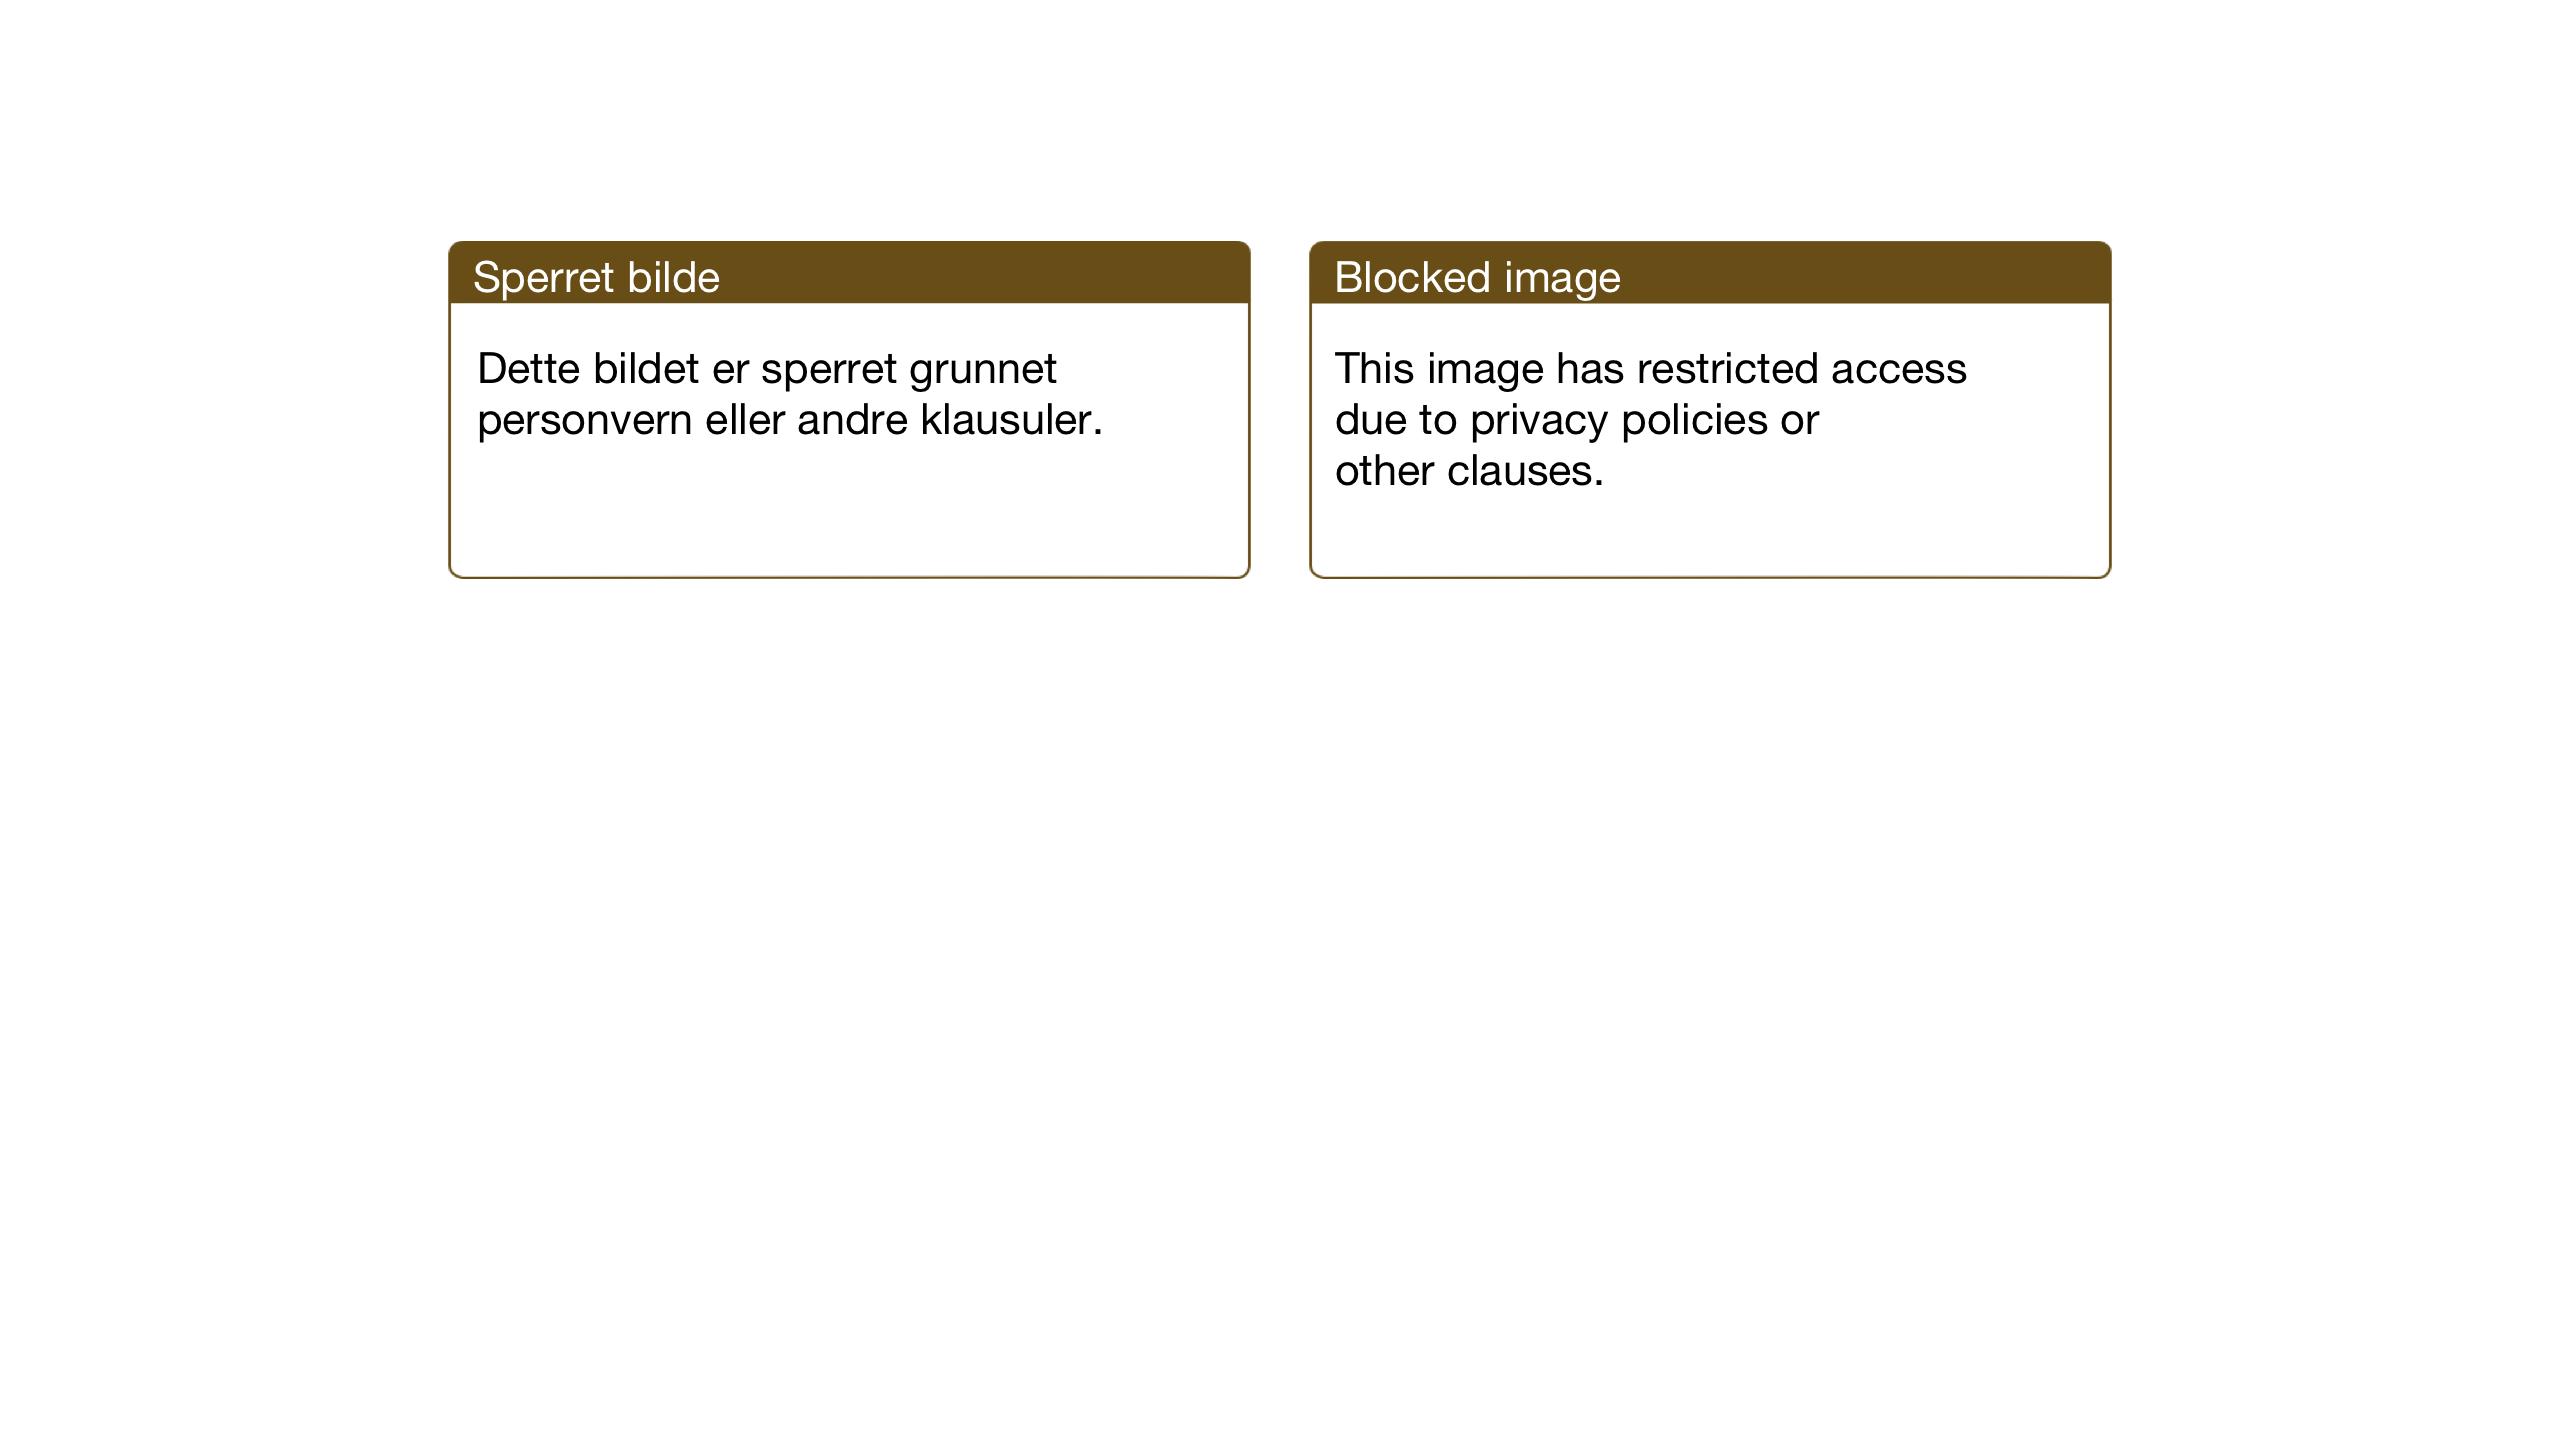 SAT, Ministerialprotokoller, klokkerbøker og fødselsregistre - Nordland, 847/L0680: Klokkerbok nr. 847C08, 1930-1947, s. 295